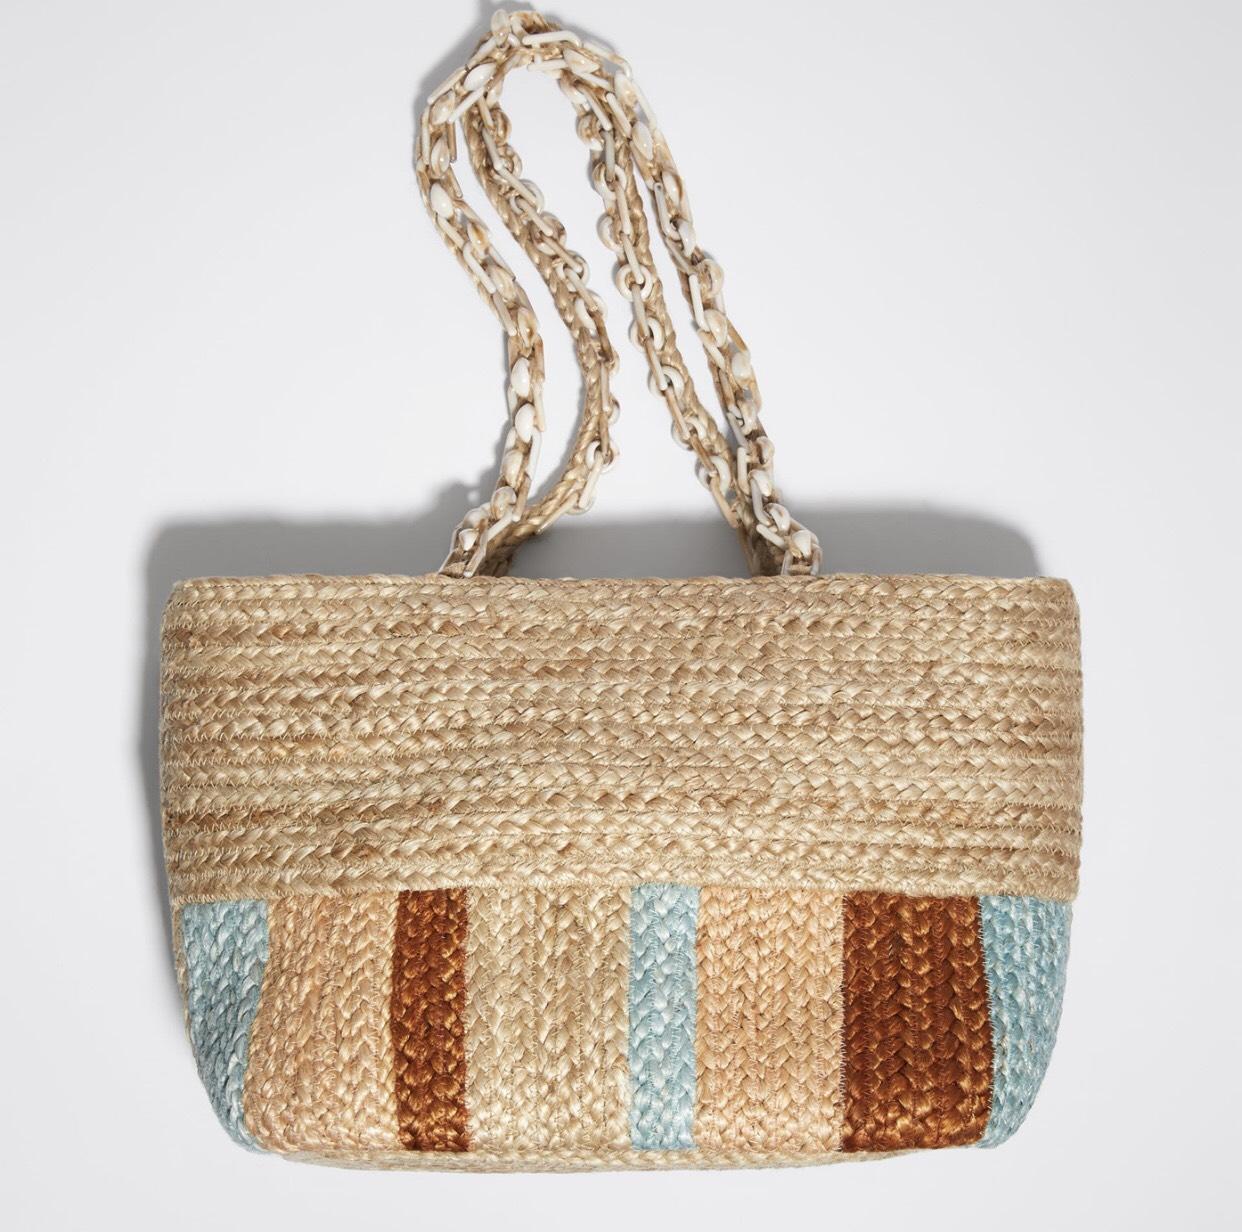 Diverse dames (zomer)tassen vanaf -50% korting online/winkel @ ZARA